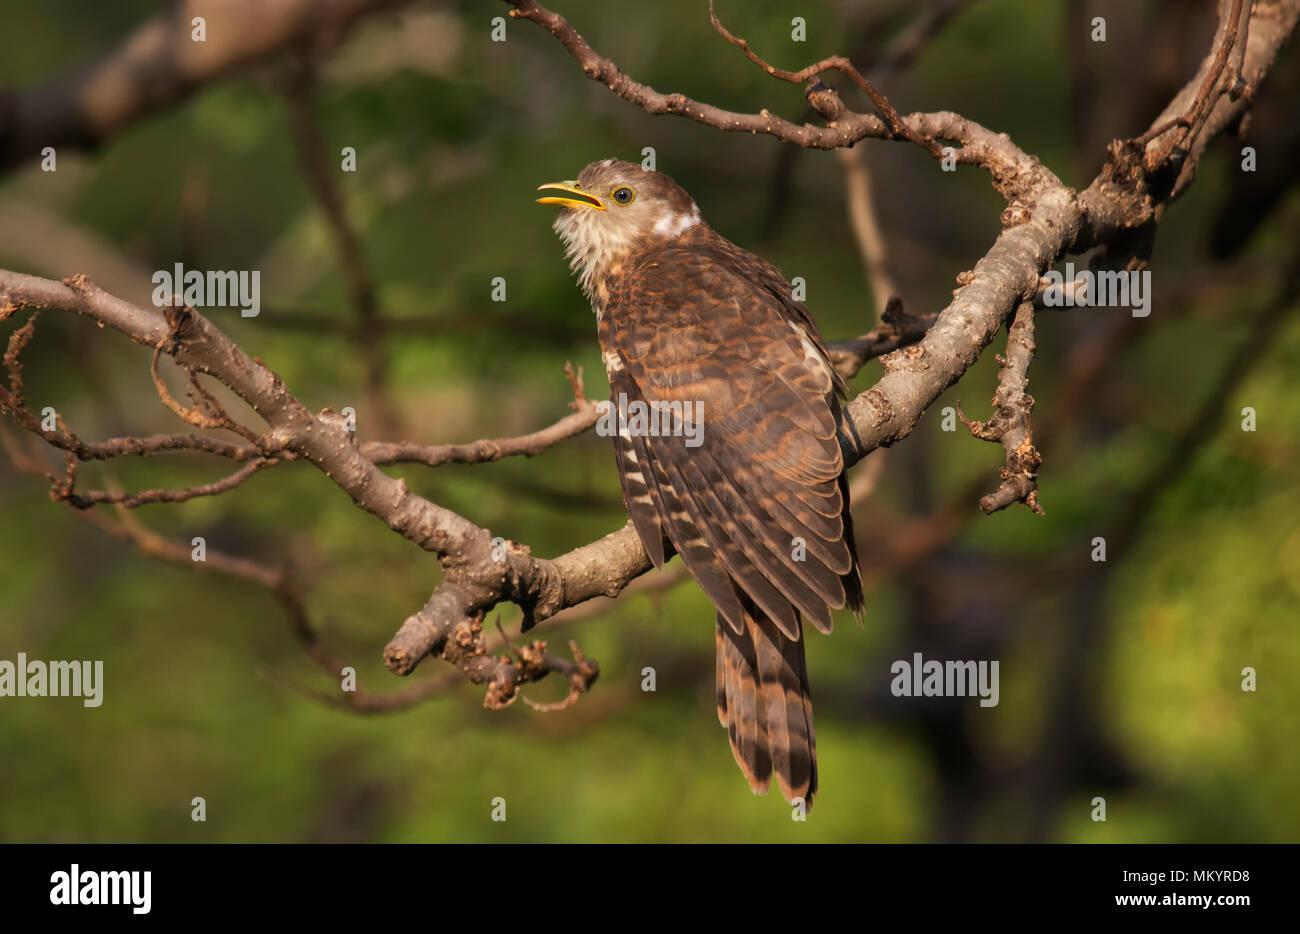 Cuckoo's Chick - Stock Image